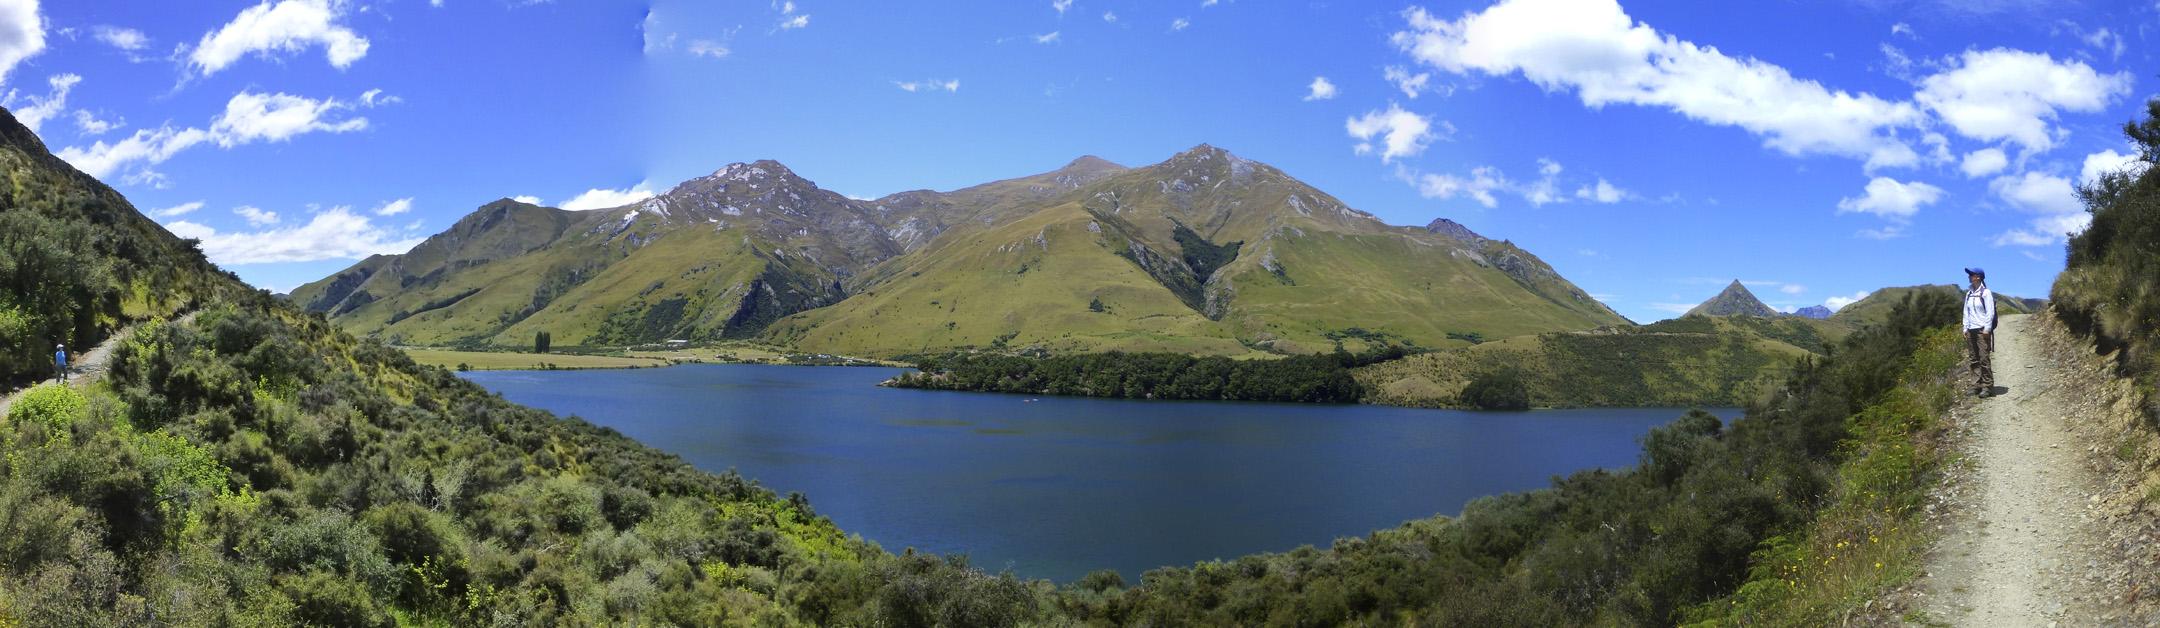 Moke Lake Panorama